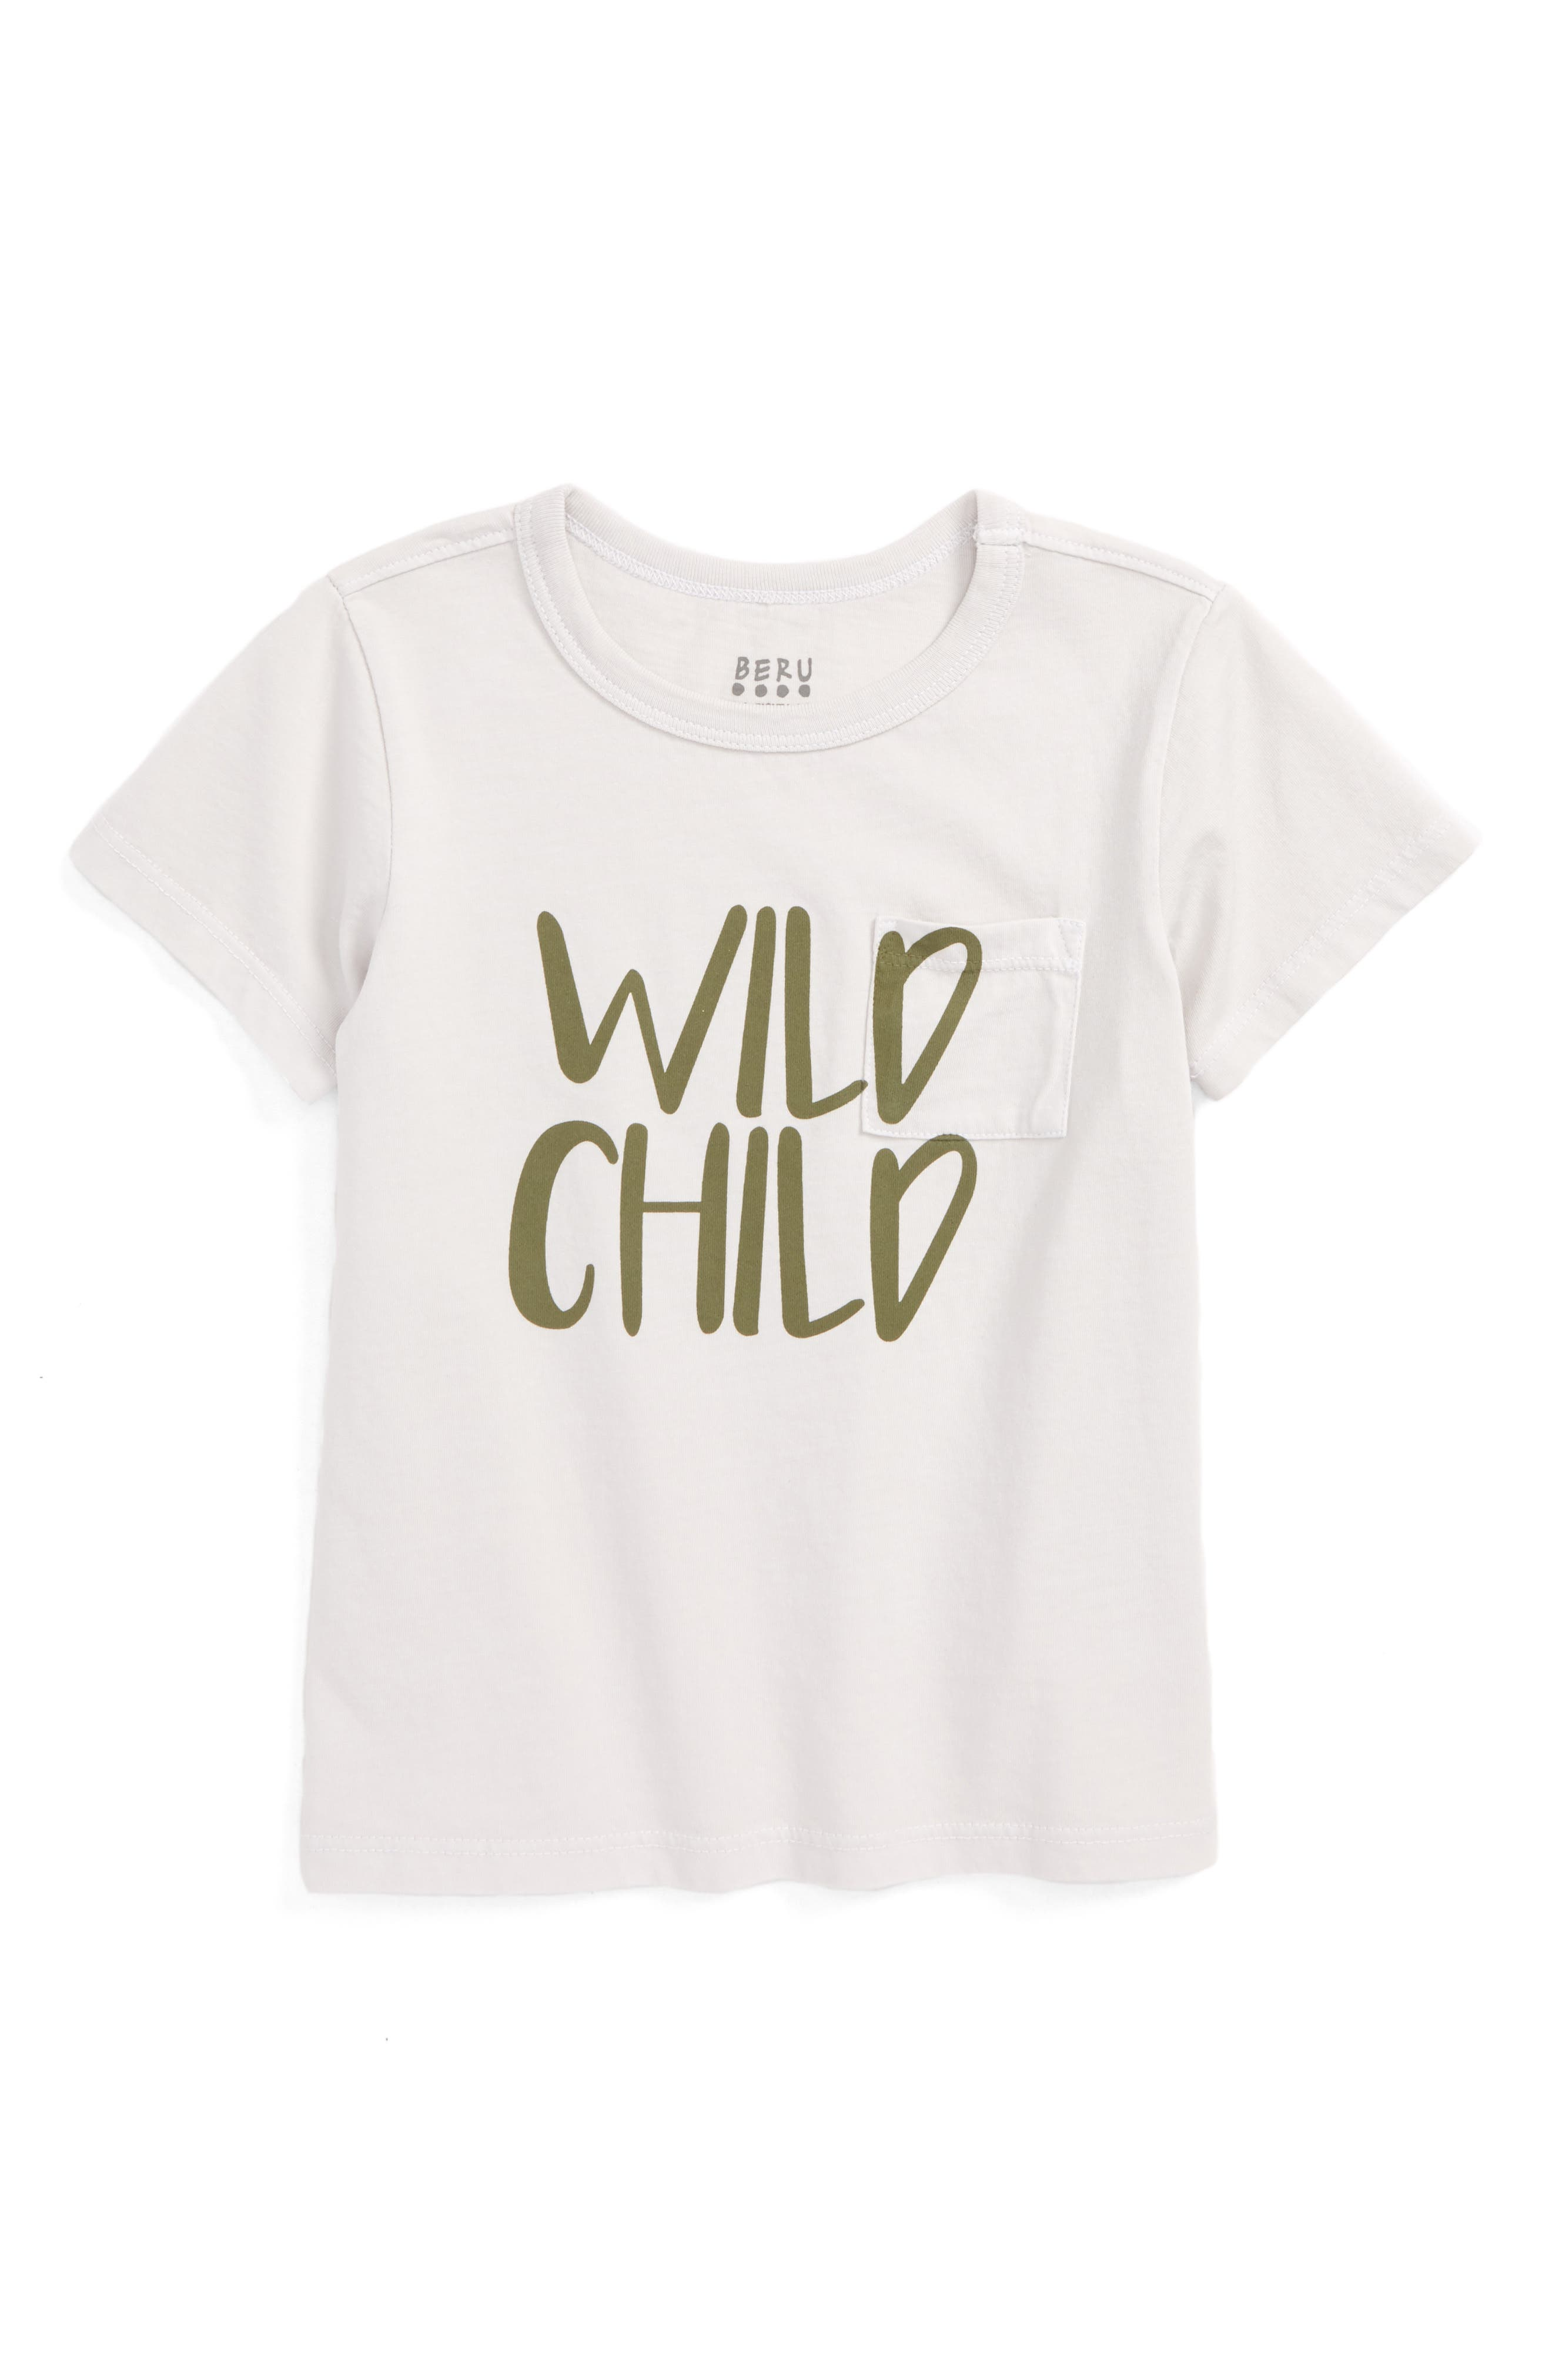 Alternate Image 1 Selected - BERU Huxley - Wild Child Organic Cotton T-Shirt (Toddler Boys & Little Boys)